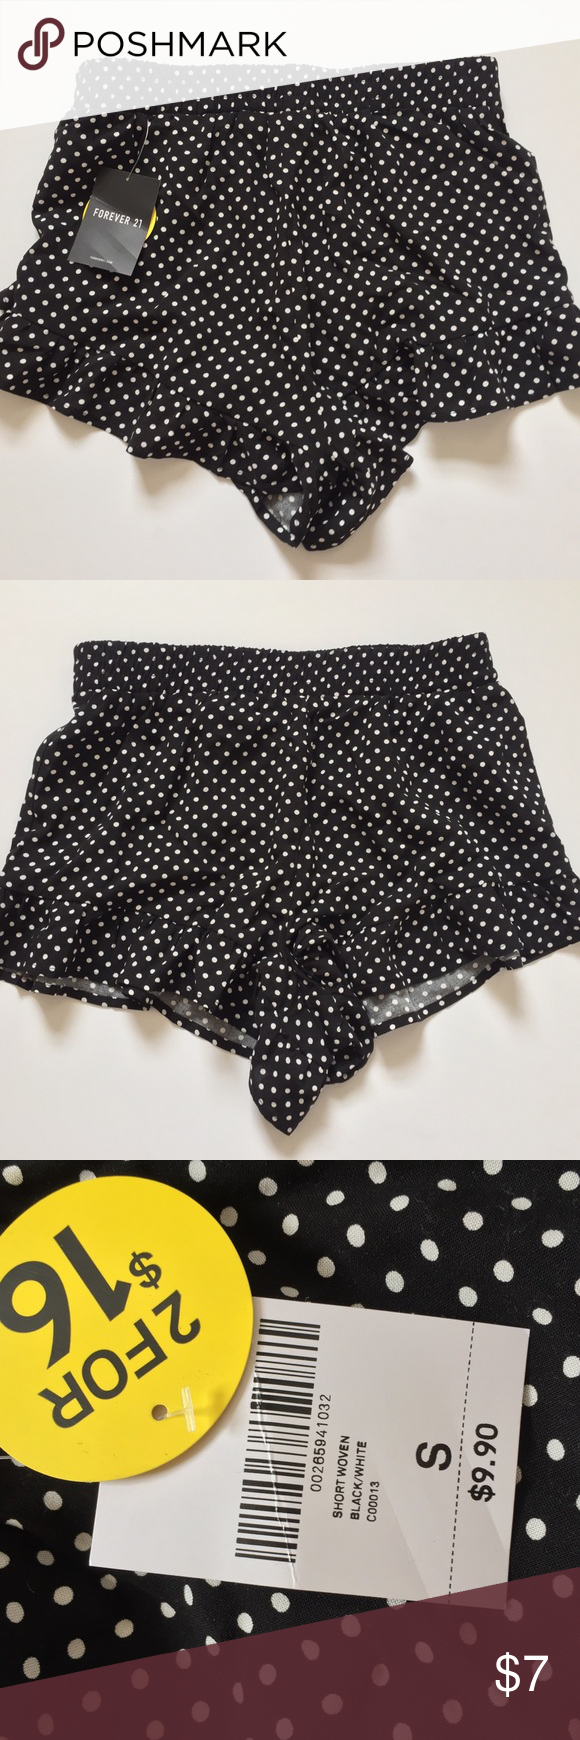 Black Polkadot shorts with ruffles